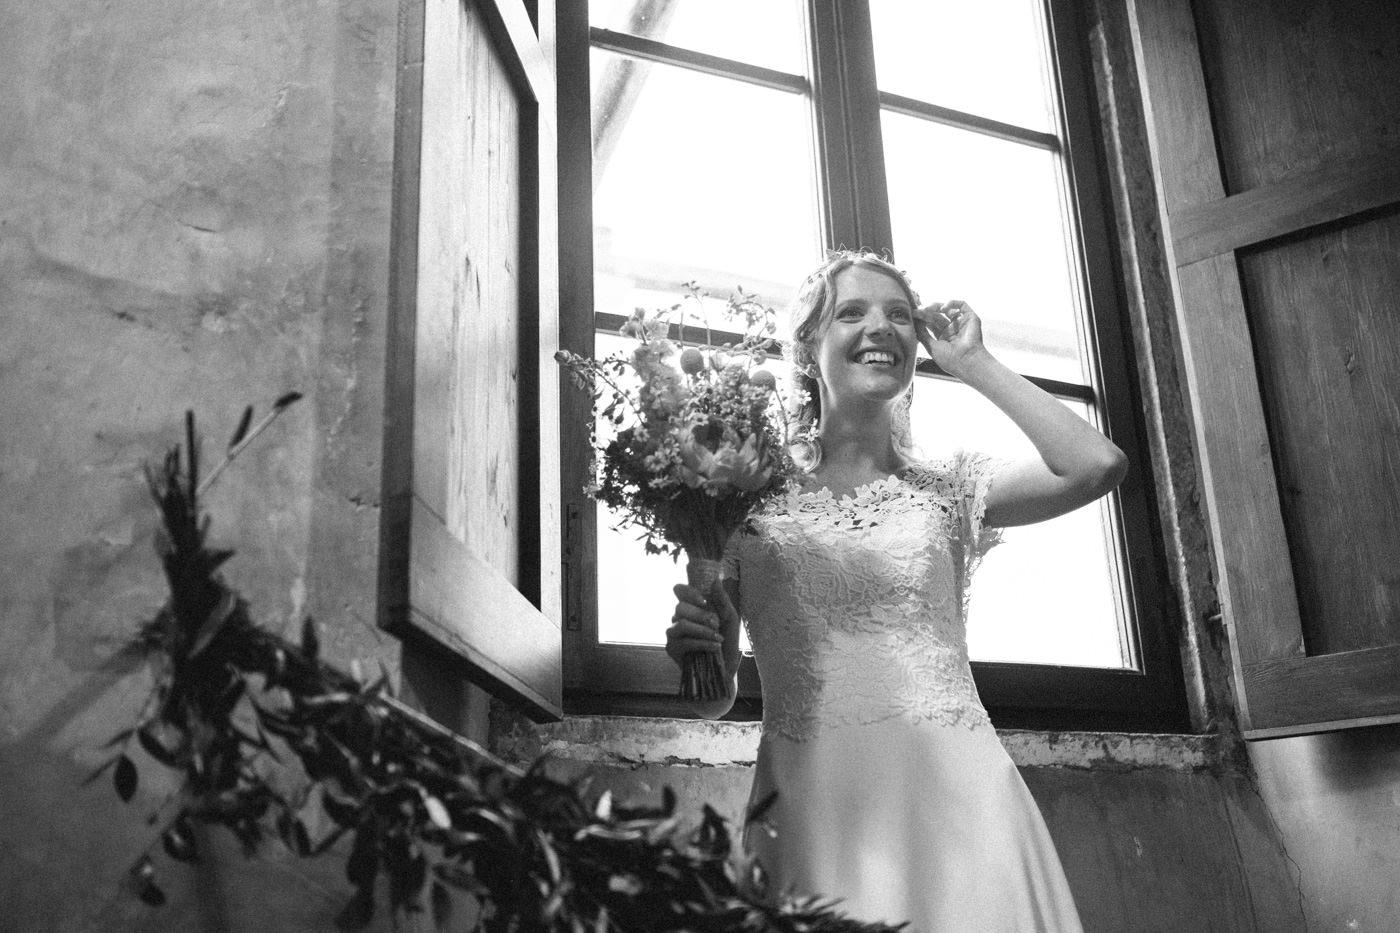 matrimoni_all_italiana_fotografo_matrimonio_toscana-79.jpg